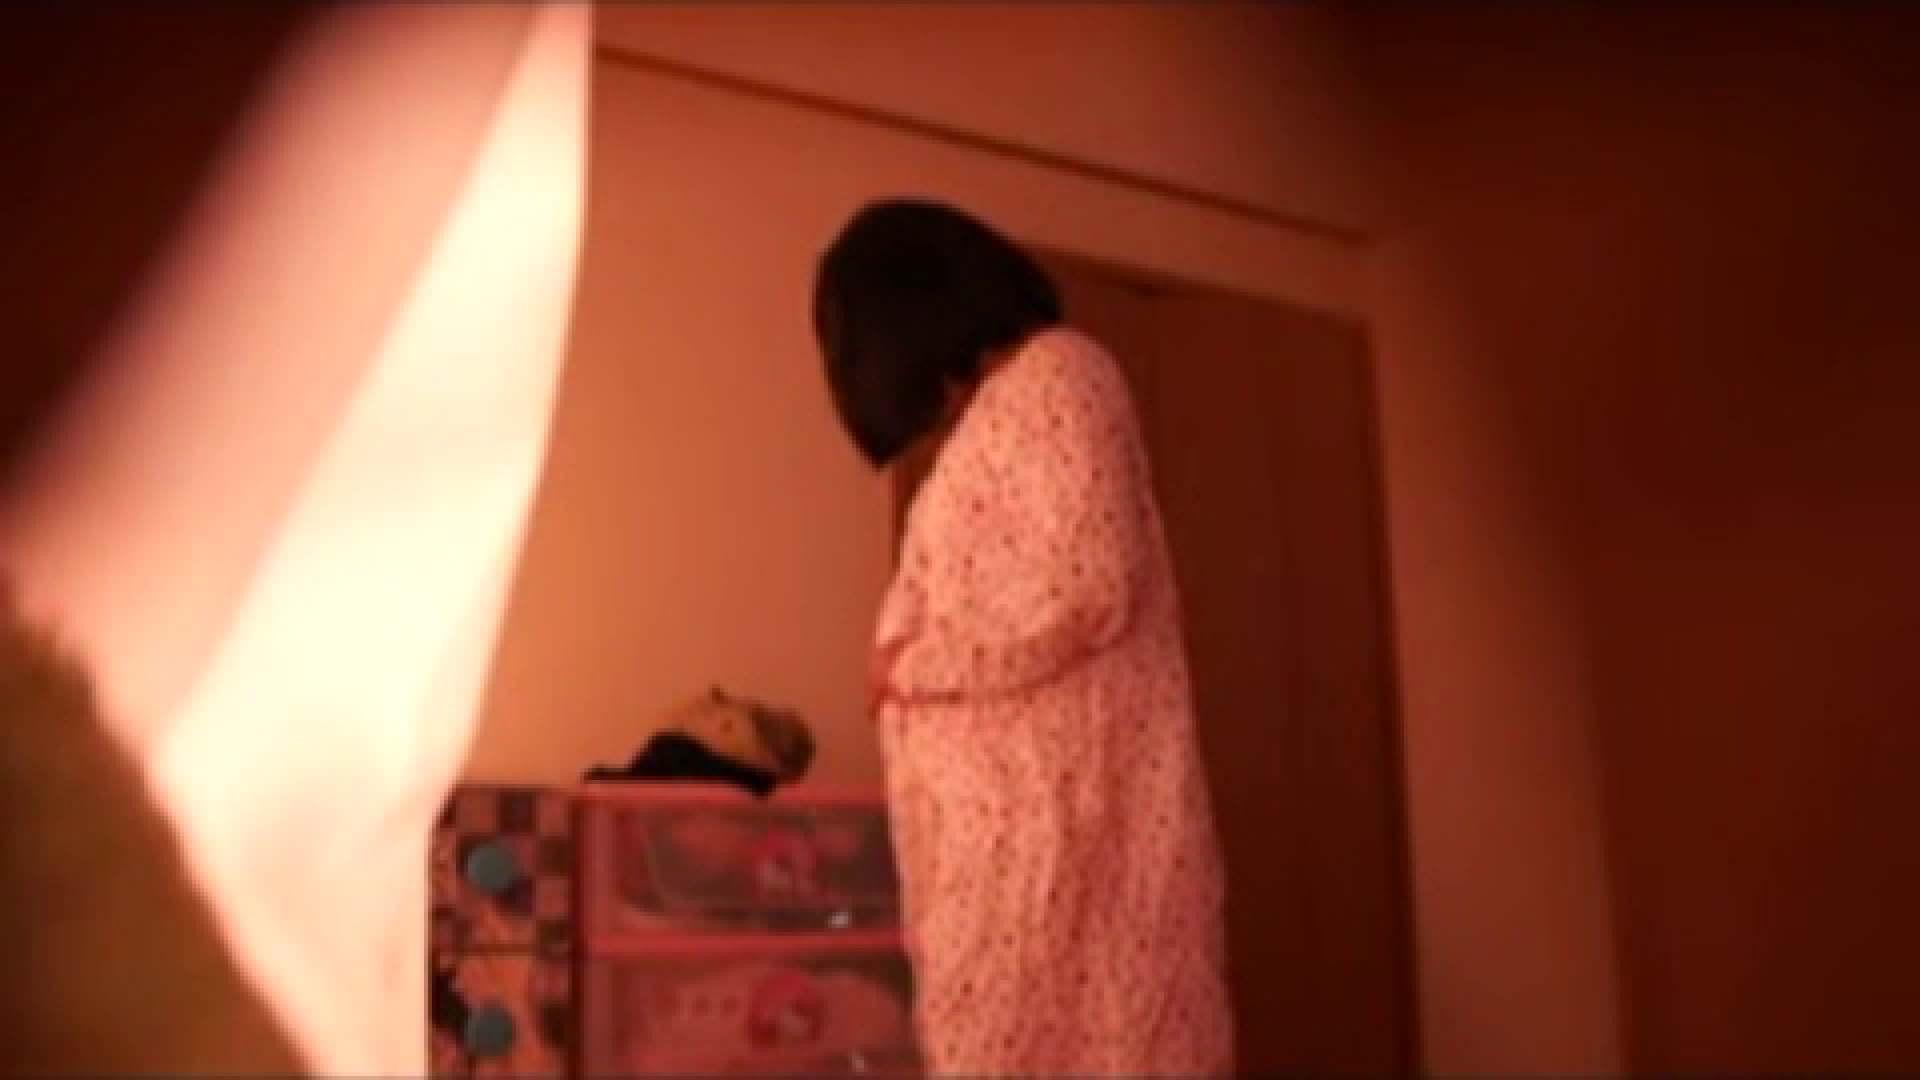 vol.2 まりこさんのお着替え、就寝前の映像です。 エッチすぎるOL達  29連発 22